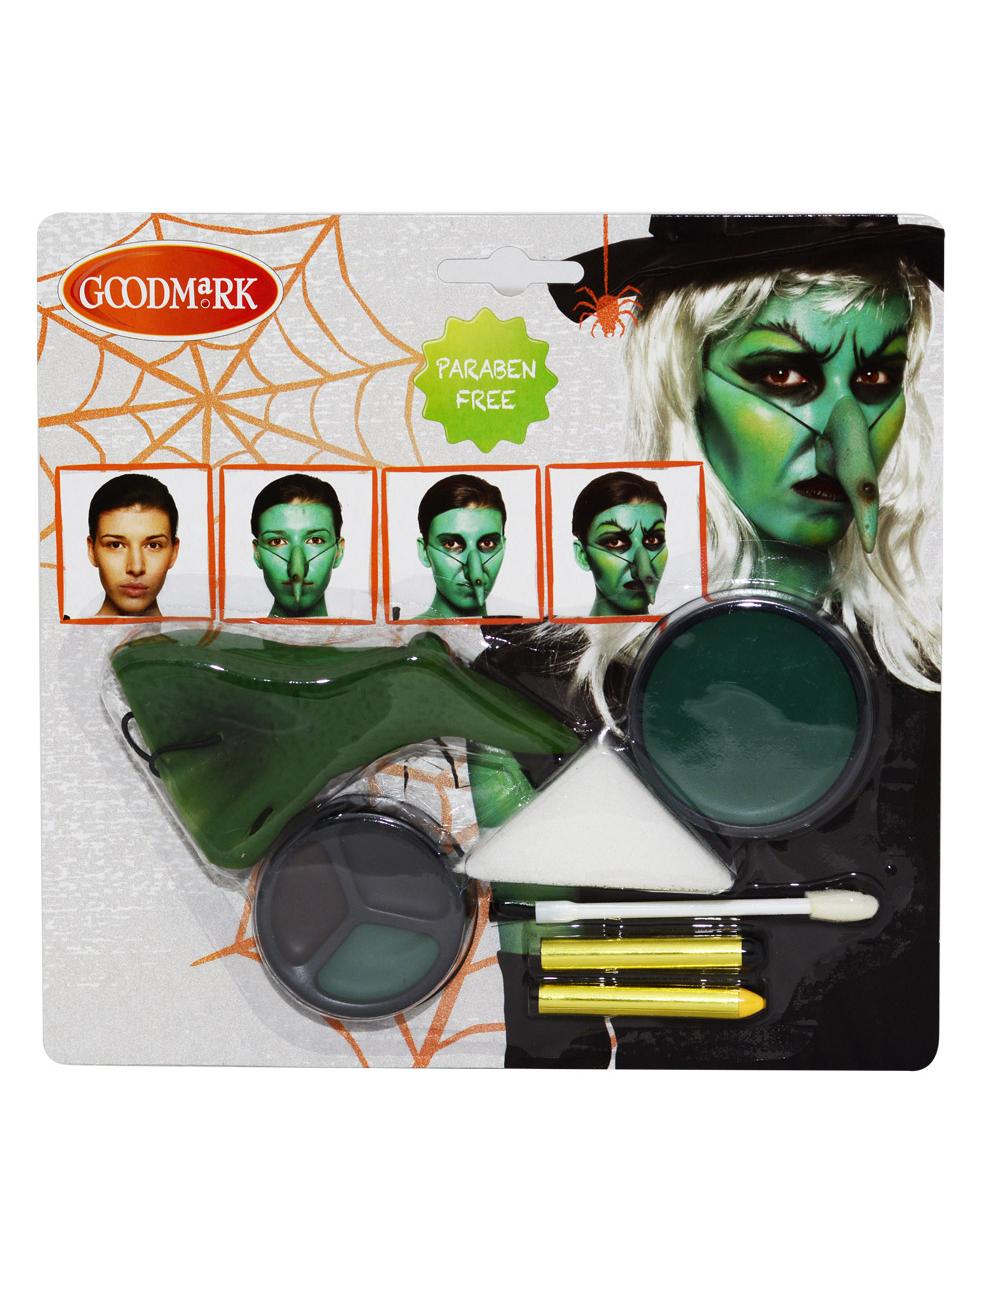 kit maquillage sorci re adulte halloween d coration anniversaire et f tes th me sur vegaoo party. Black Bedroom Furniture Sets. Home Design Ideas